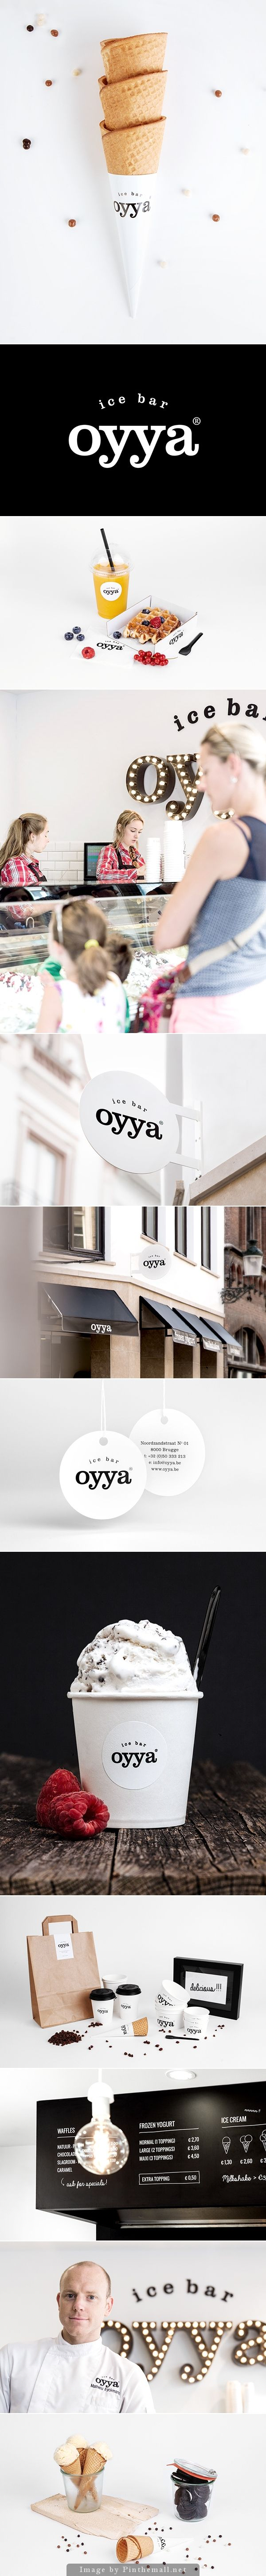 oyya - ice bar   by Skinn Branding Agency